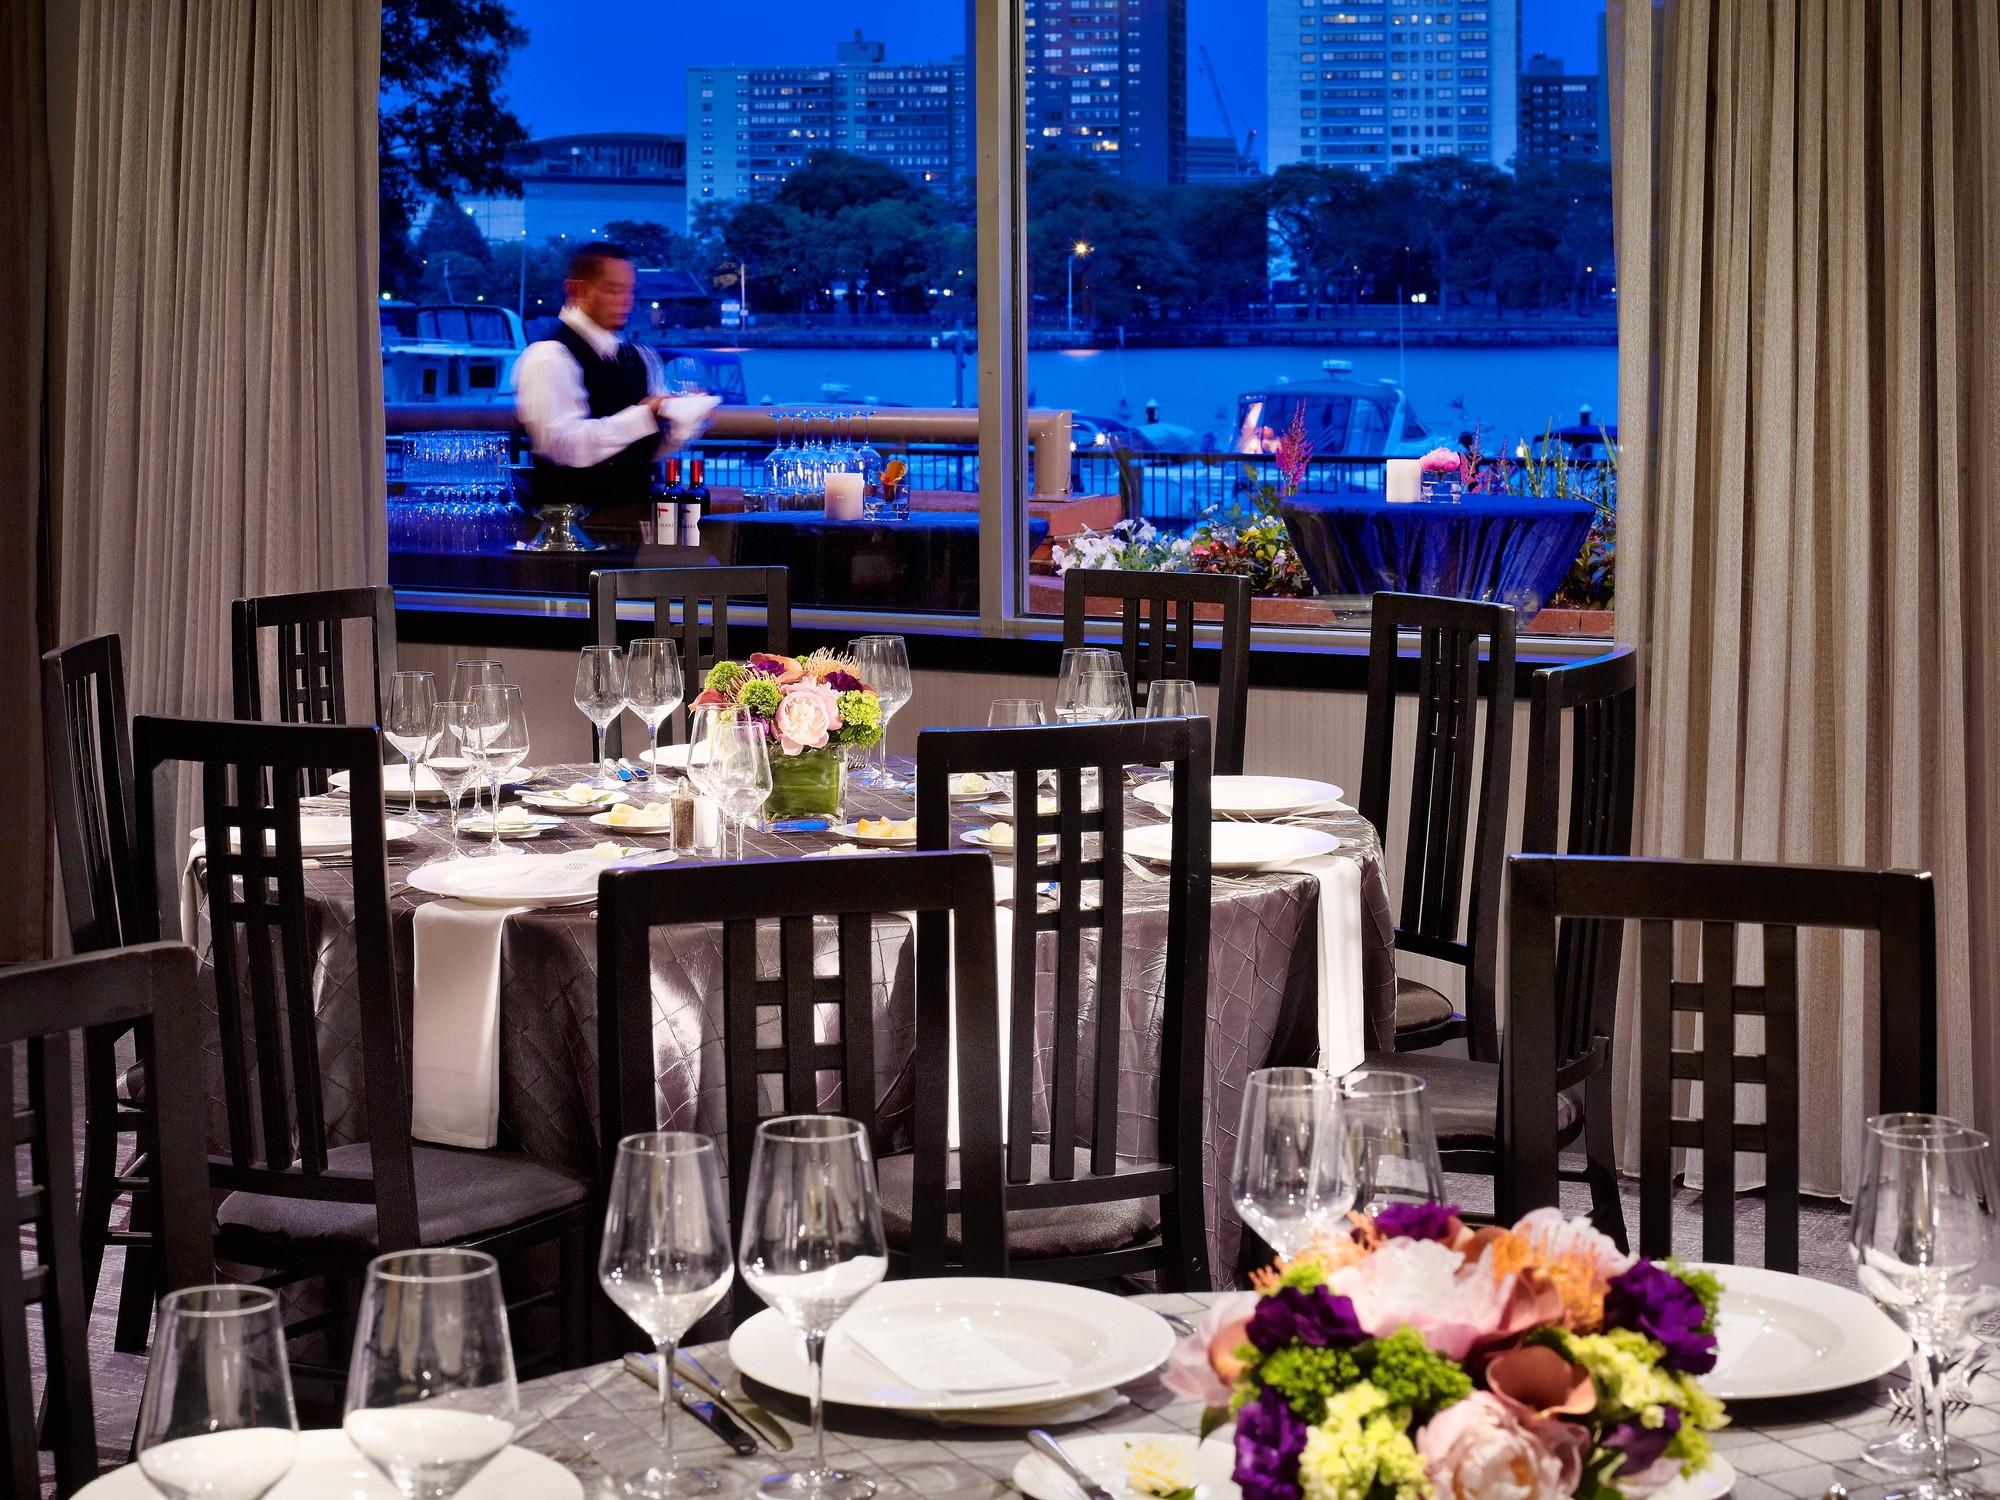 Royal Sonesta Boston Meeting Dining Tables Waiter